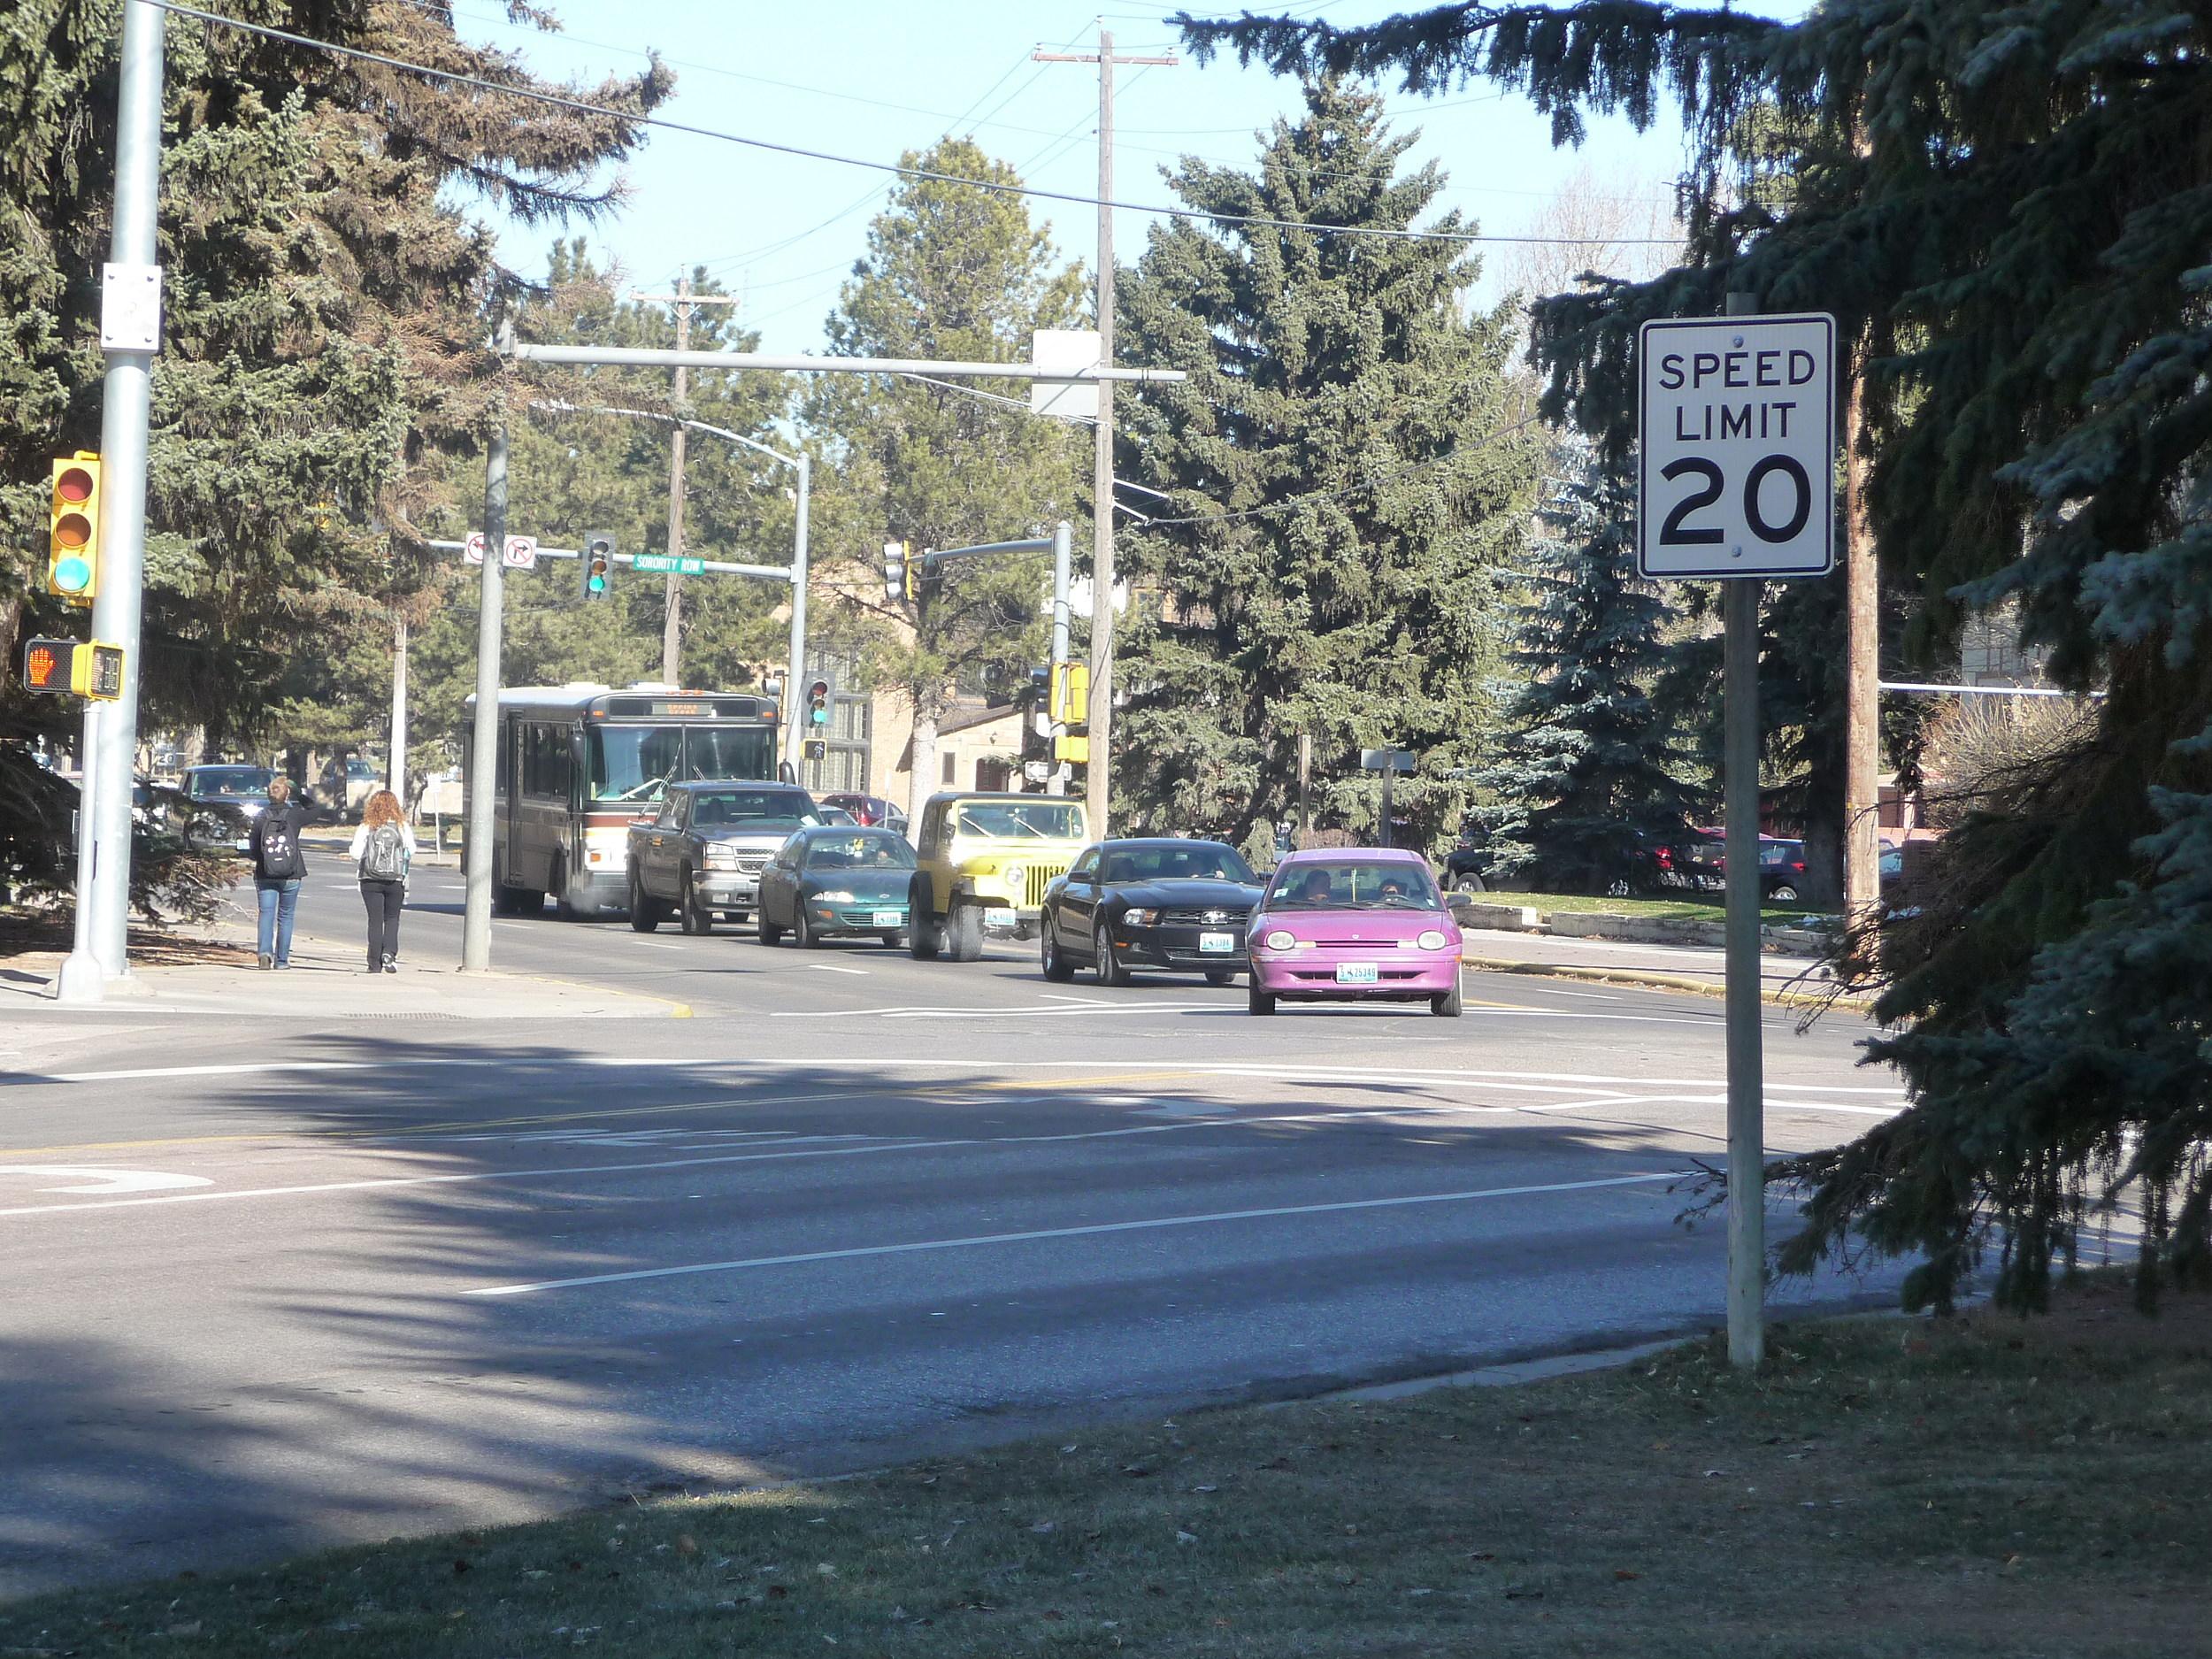 15th Street, Laramie, Dorms, Cross Walk